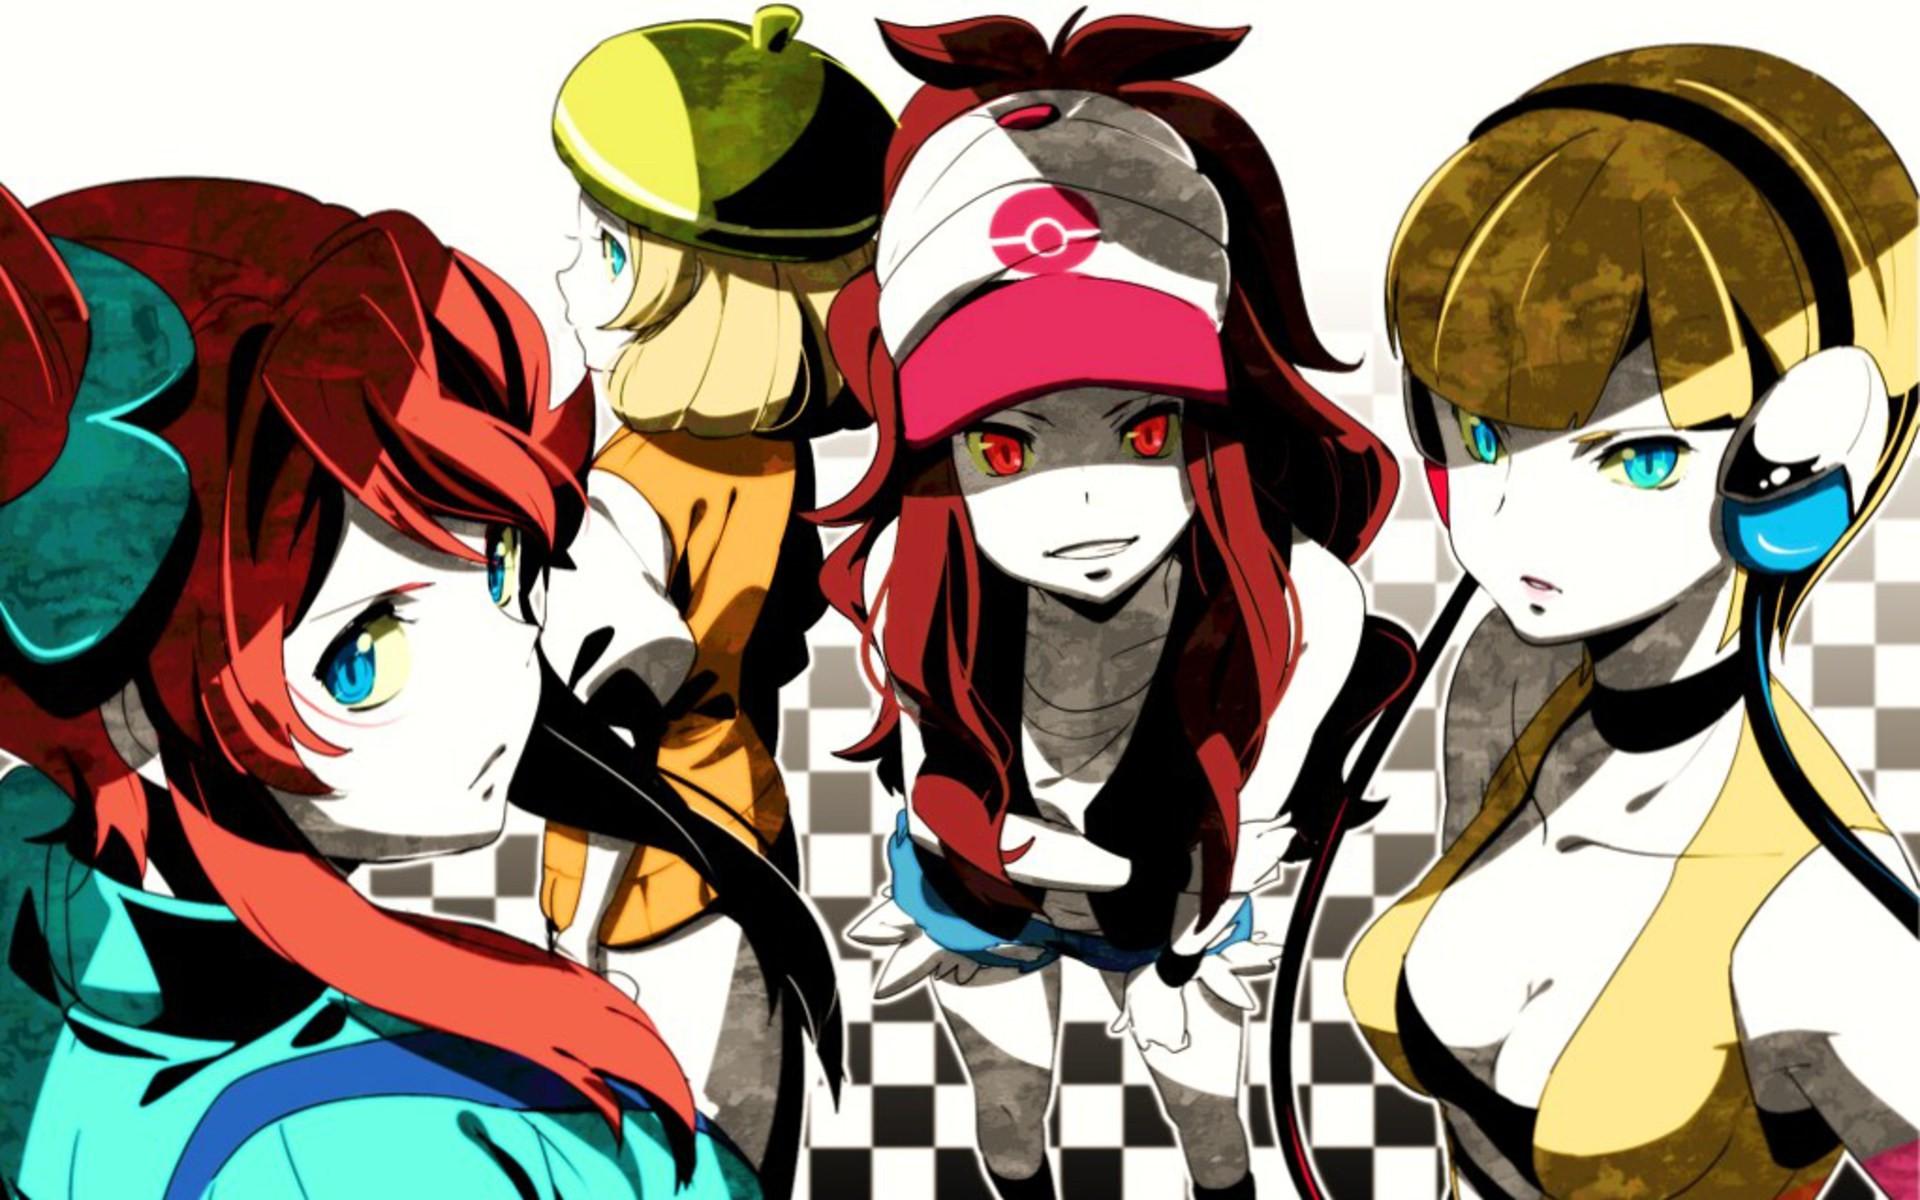 pixel-pokemon-trainer-wallpaper-4.jpg (1920×1200) | Pokemon | Pinterest |  Pokémon